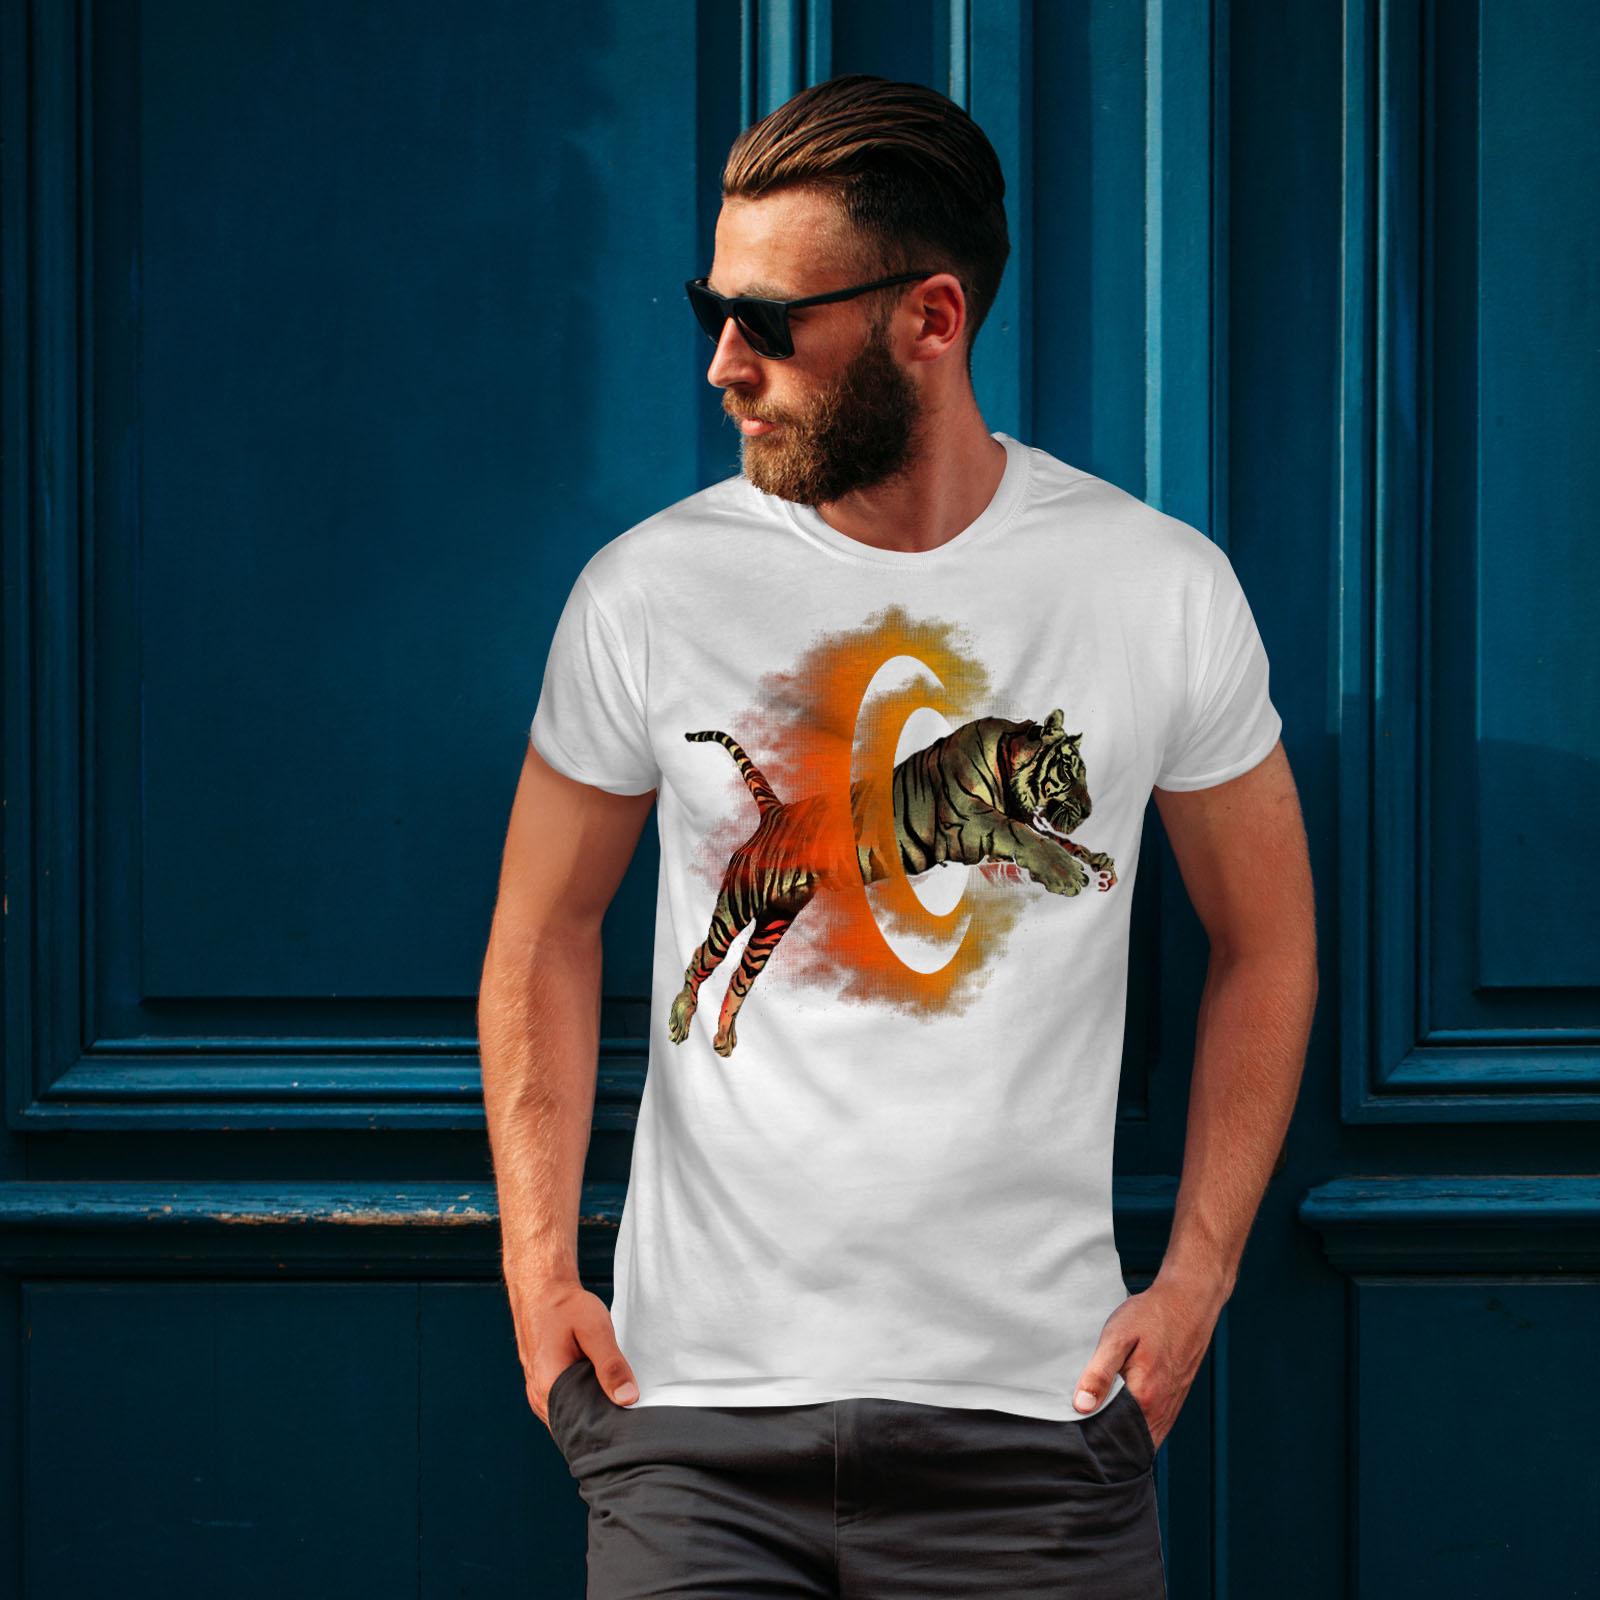 Wellcoda-Tiger-Portal-Cool-Mens-T-shirt-Flame-Graphic-Design-Printed-Tee thumbnail 10